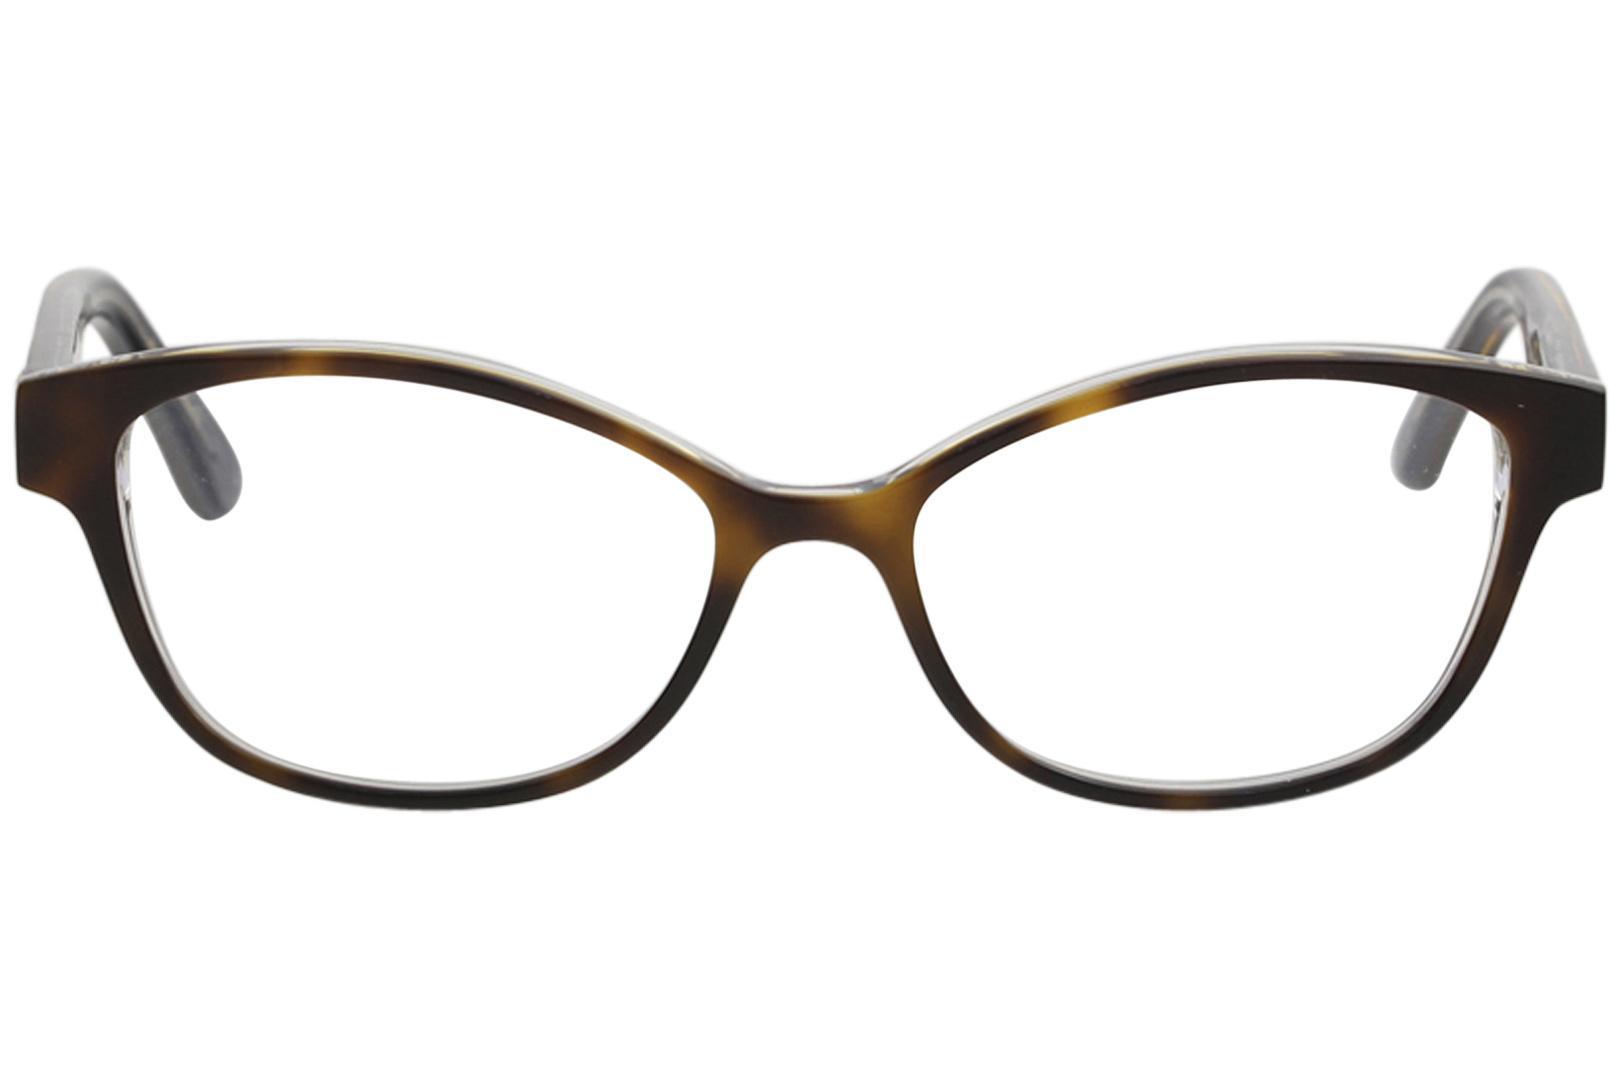 562dd890b3 Vera Wang Eyeglasses Mazzoli Full Rim Optical Frame by Vera Wang